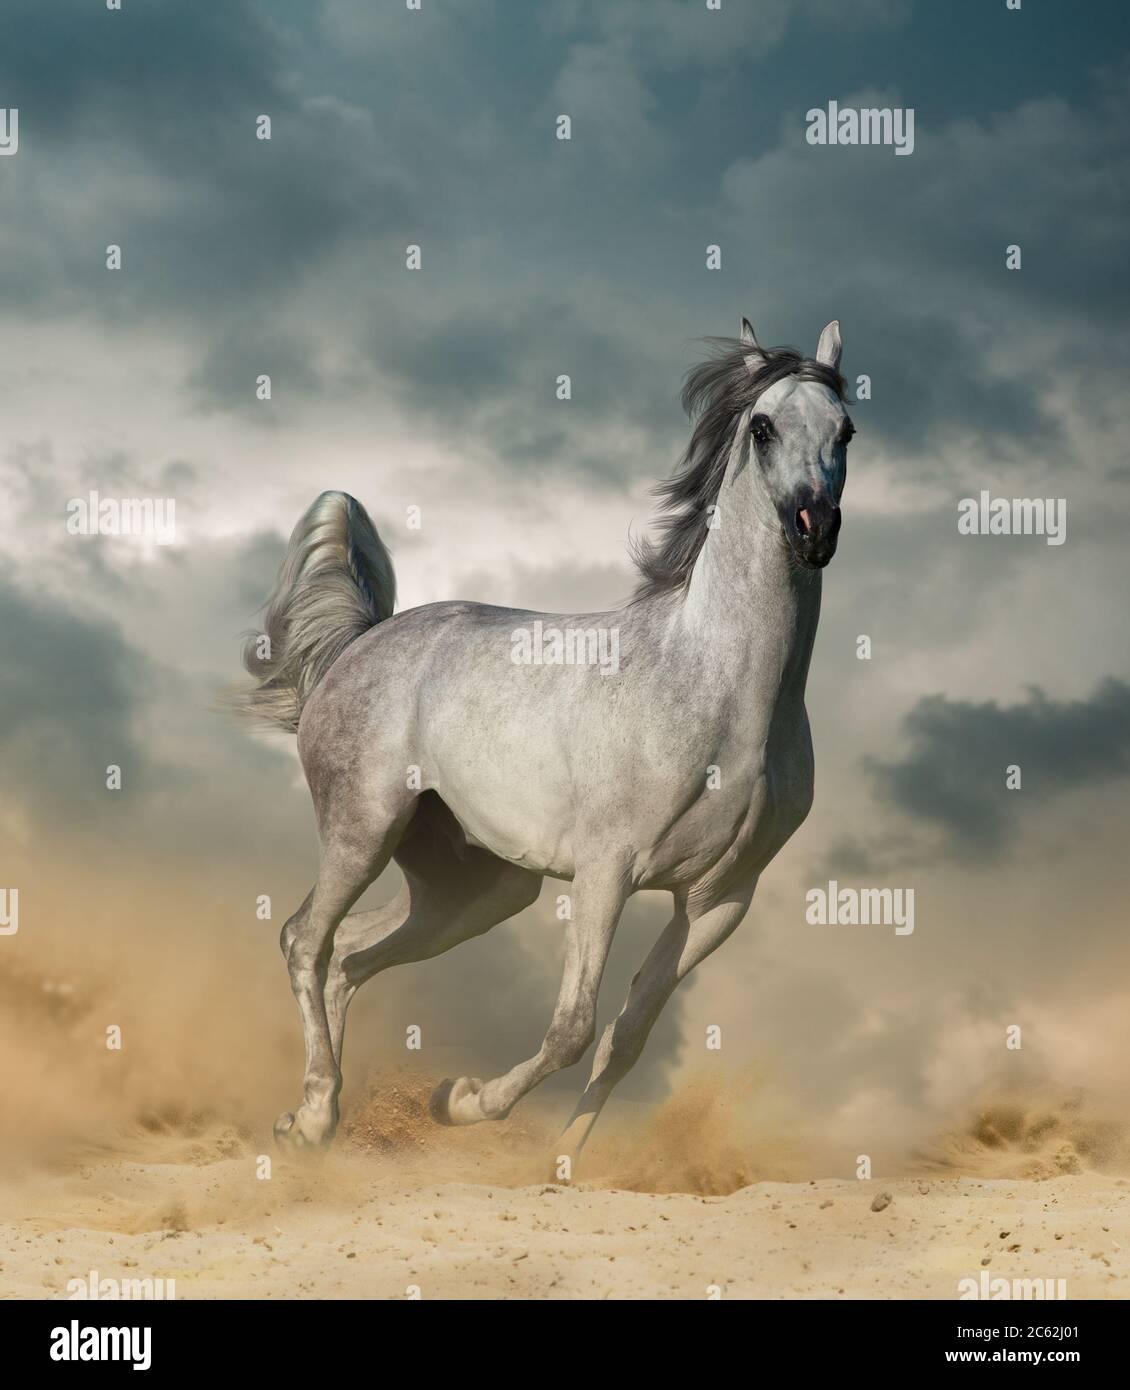 Beautiful Arabian Horse In Desert Runninf Wild Under Cloudy Sky Stock Photo Alamy